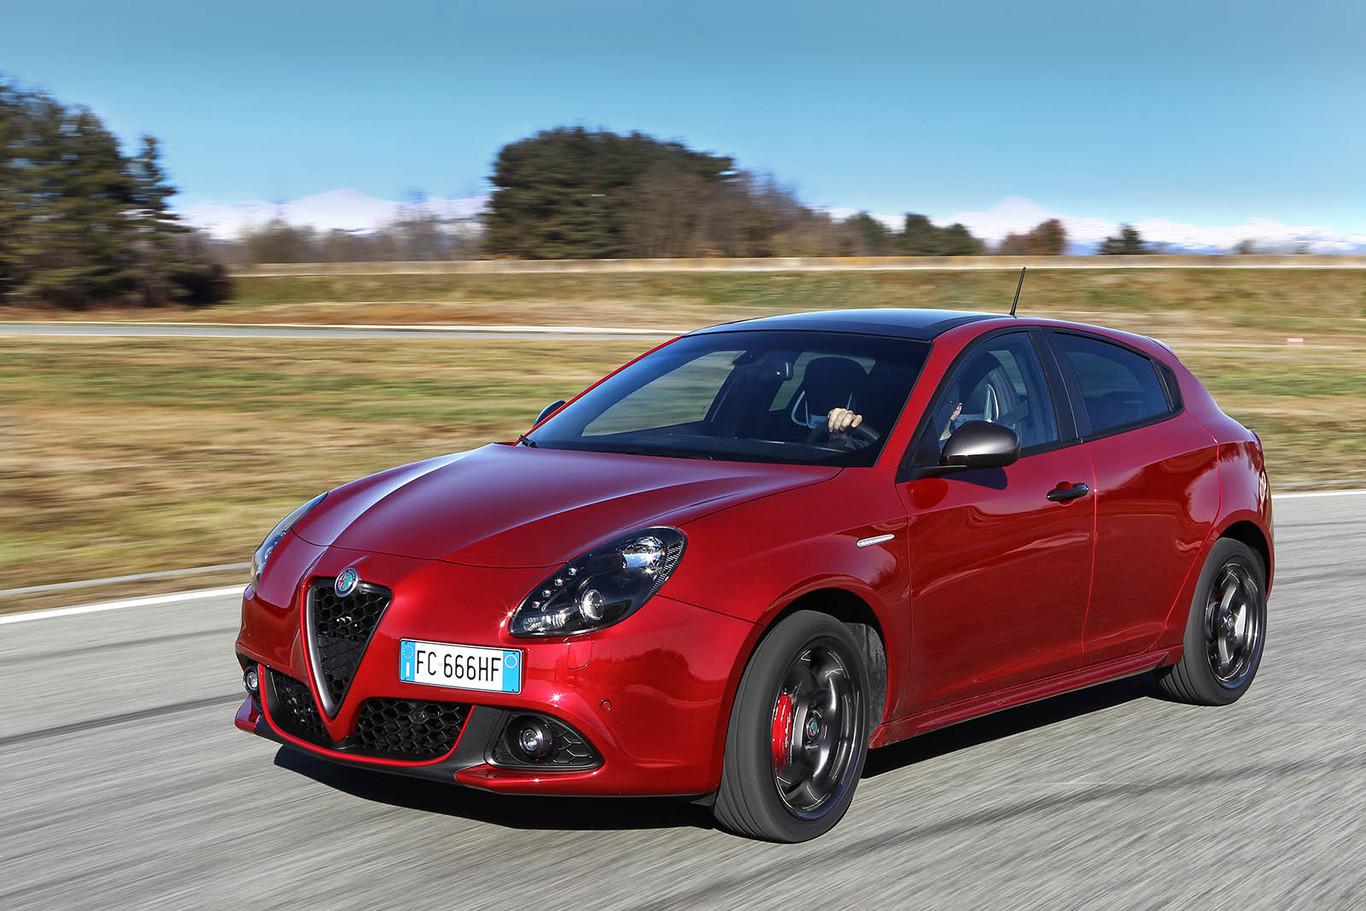 2021 Alfa Romeo Giulietta Price